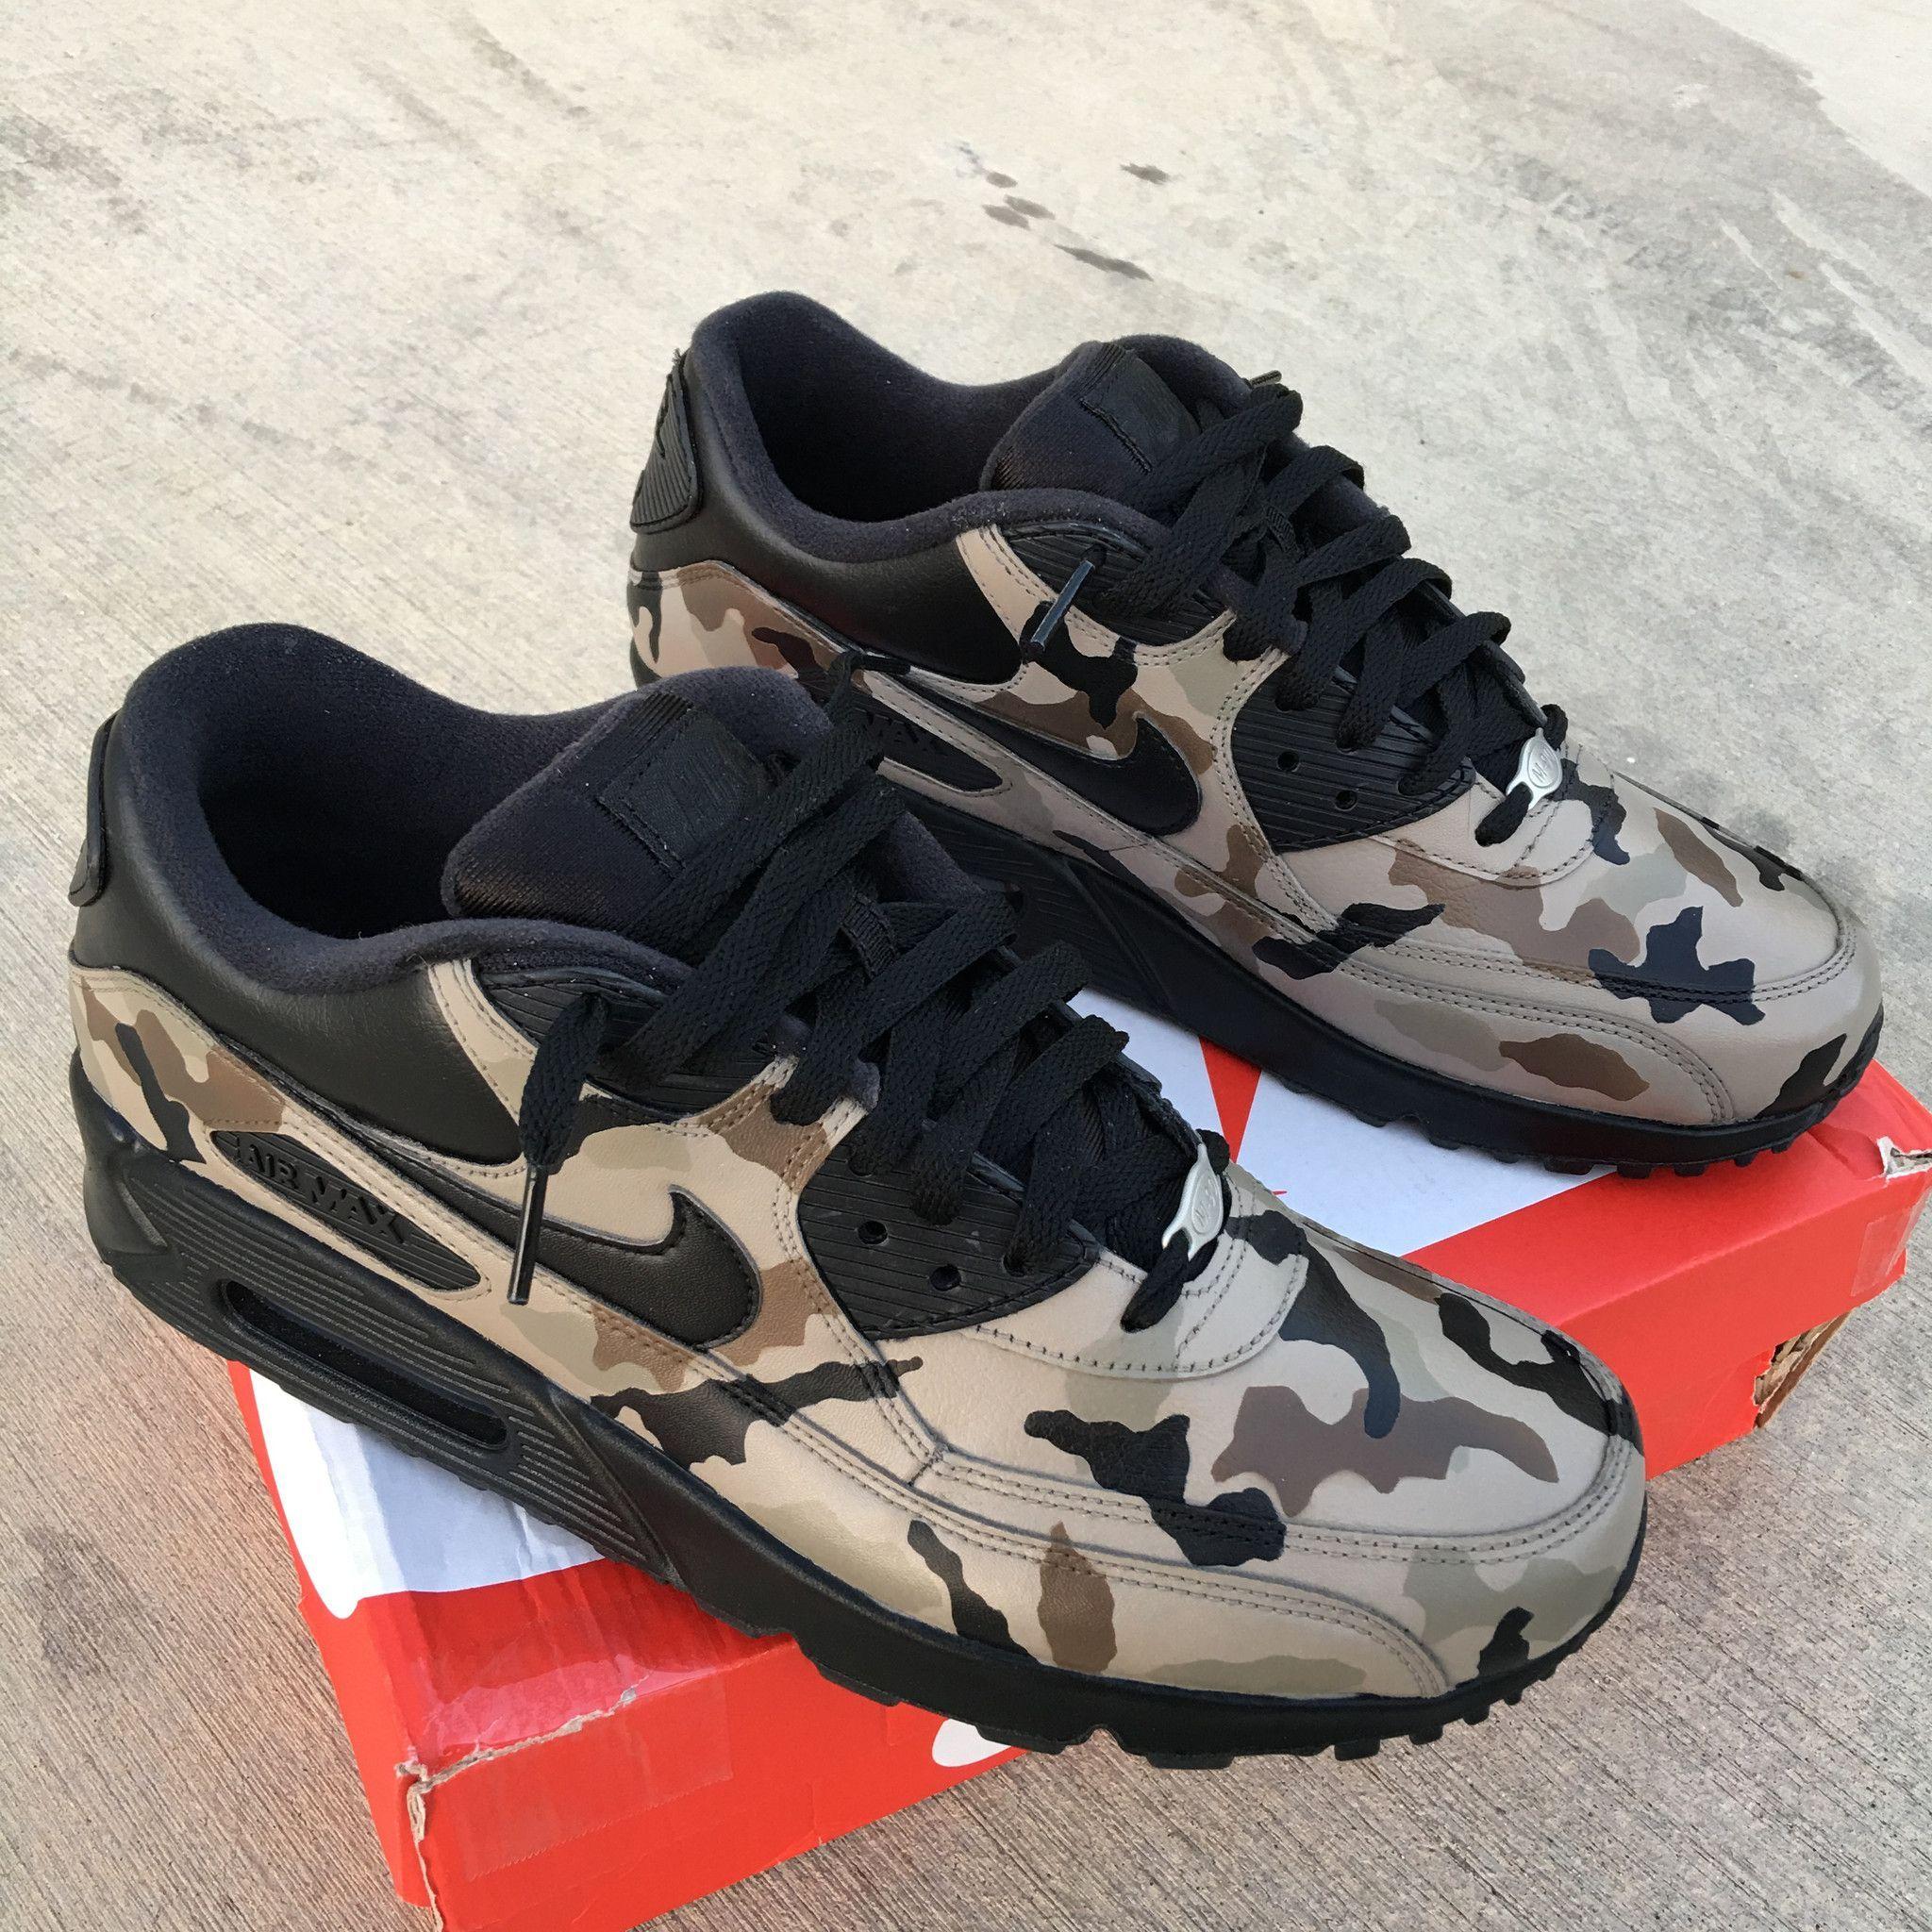 Custom Hand painted Nike AM90 Desert Camo Shoes. Each pair